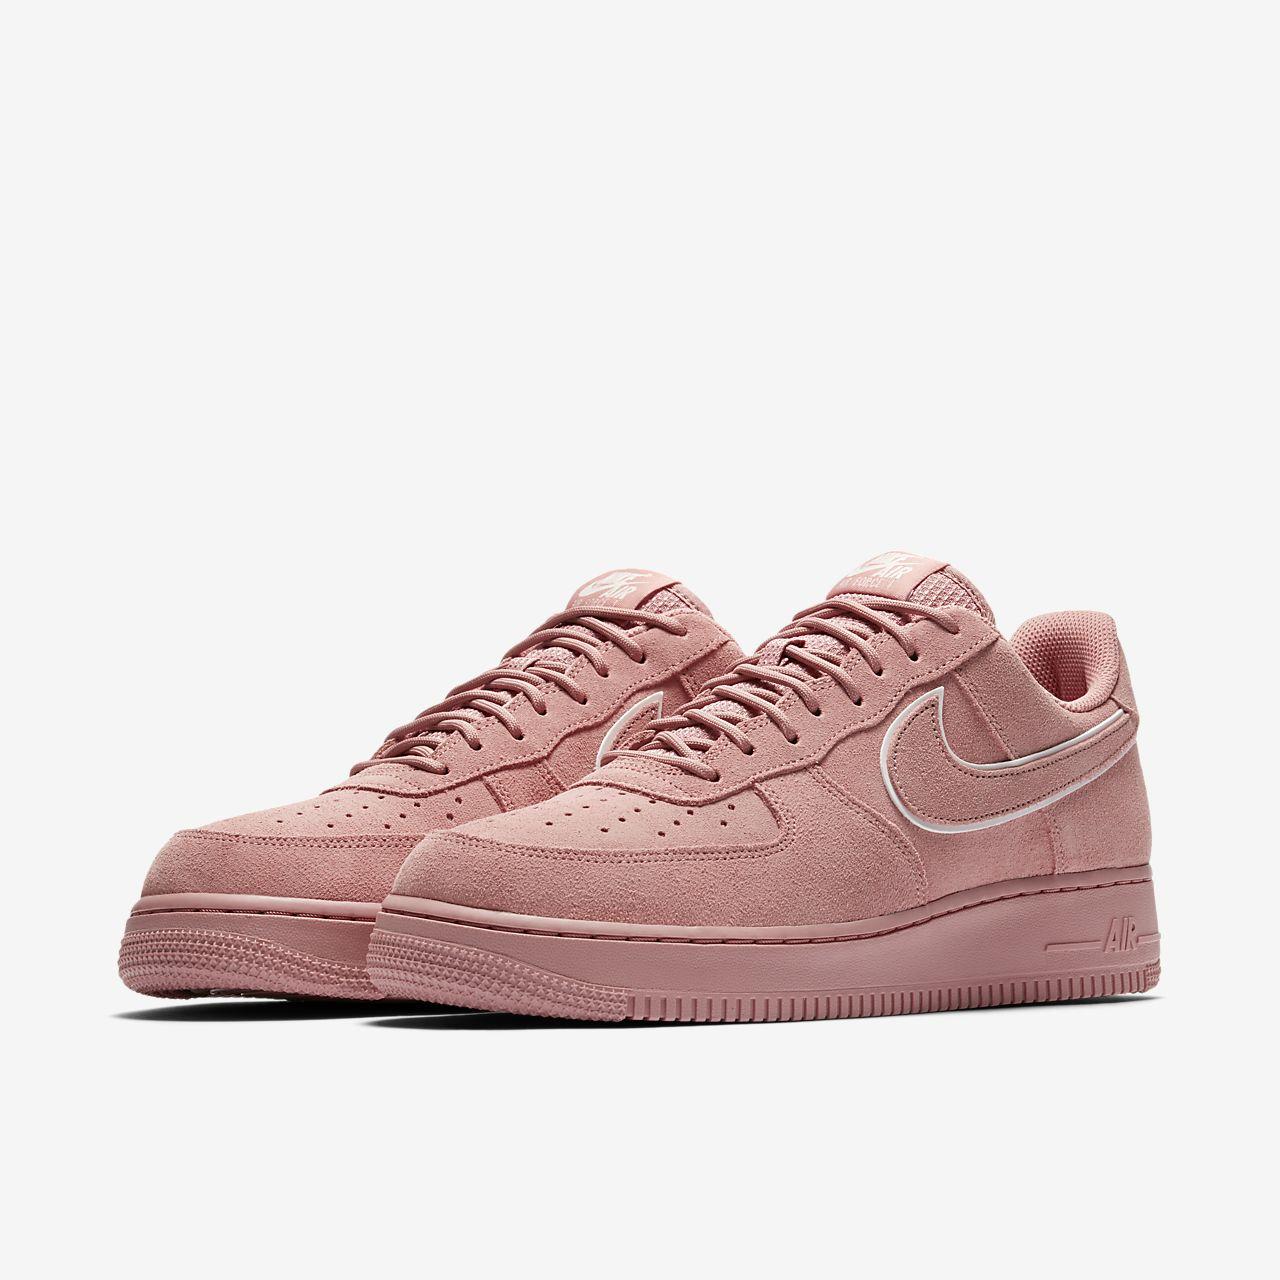 Nike Pink Air Force 1 07 Lv8 Suede